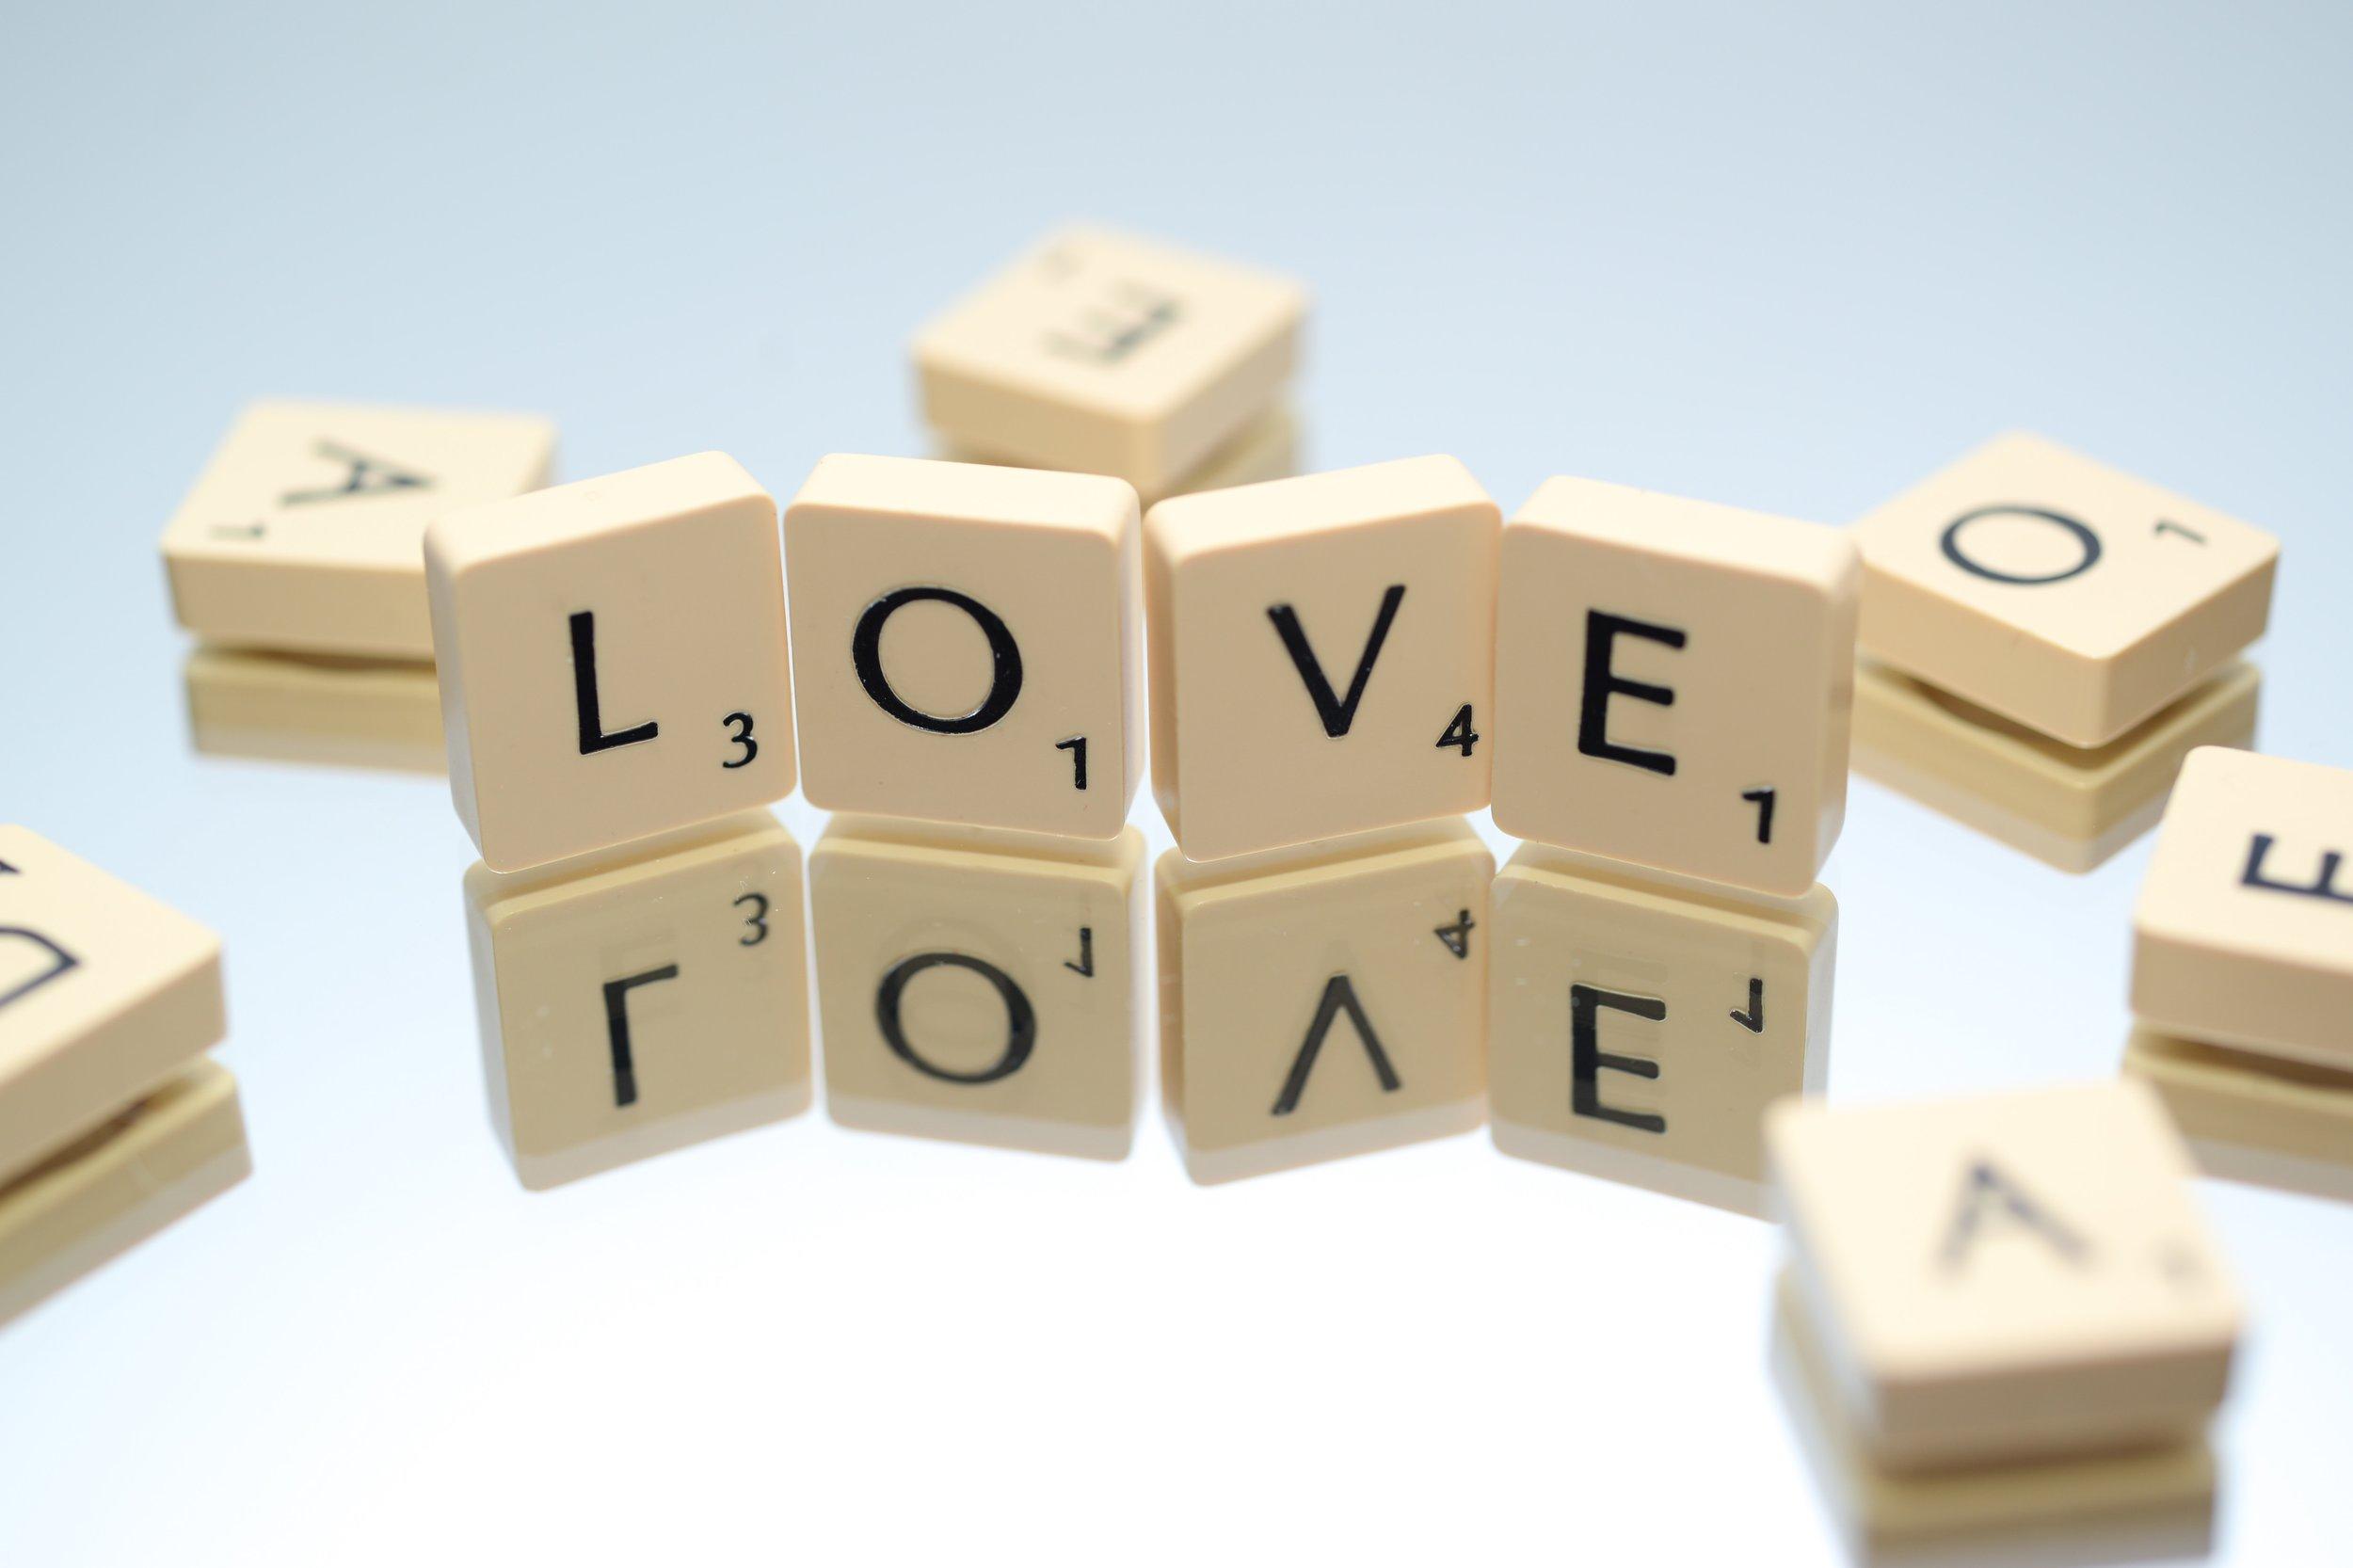 love-alphabet-board-game-conceptual-699620-pexels-free.jpg